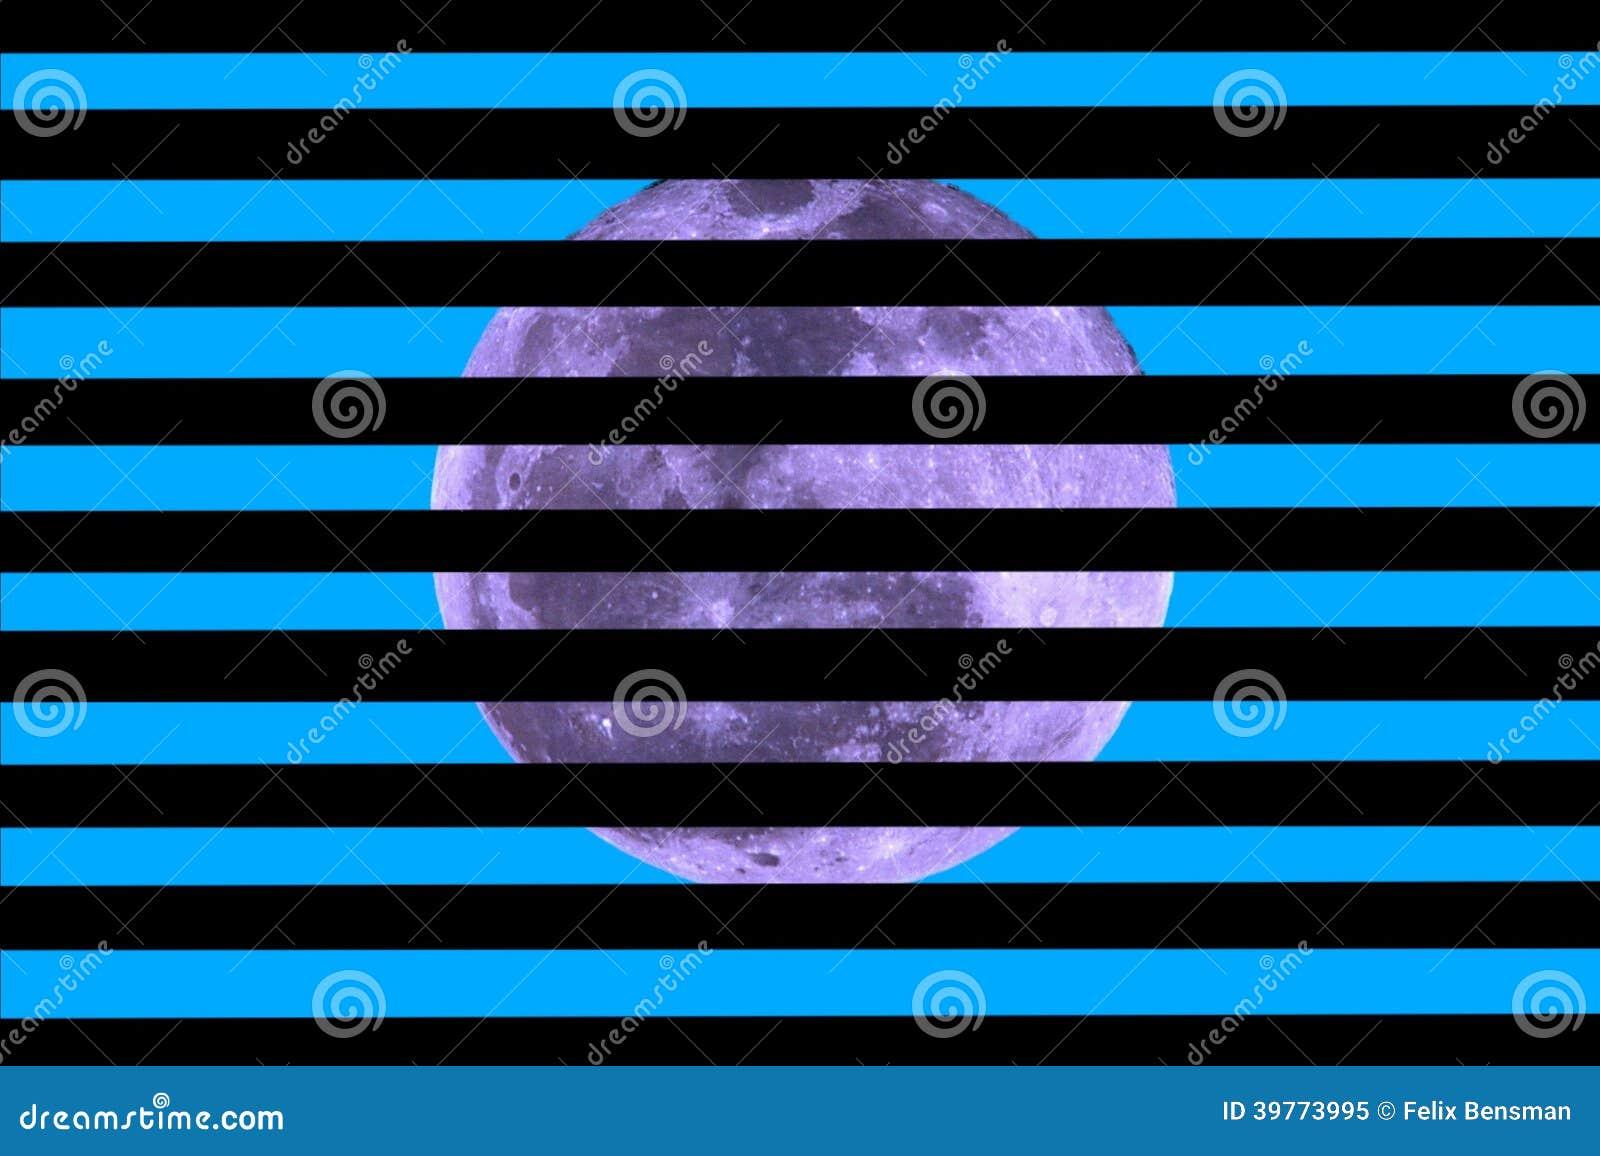 Księżyc na błękitnym tle